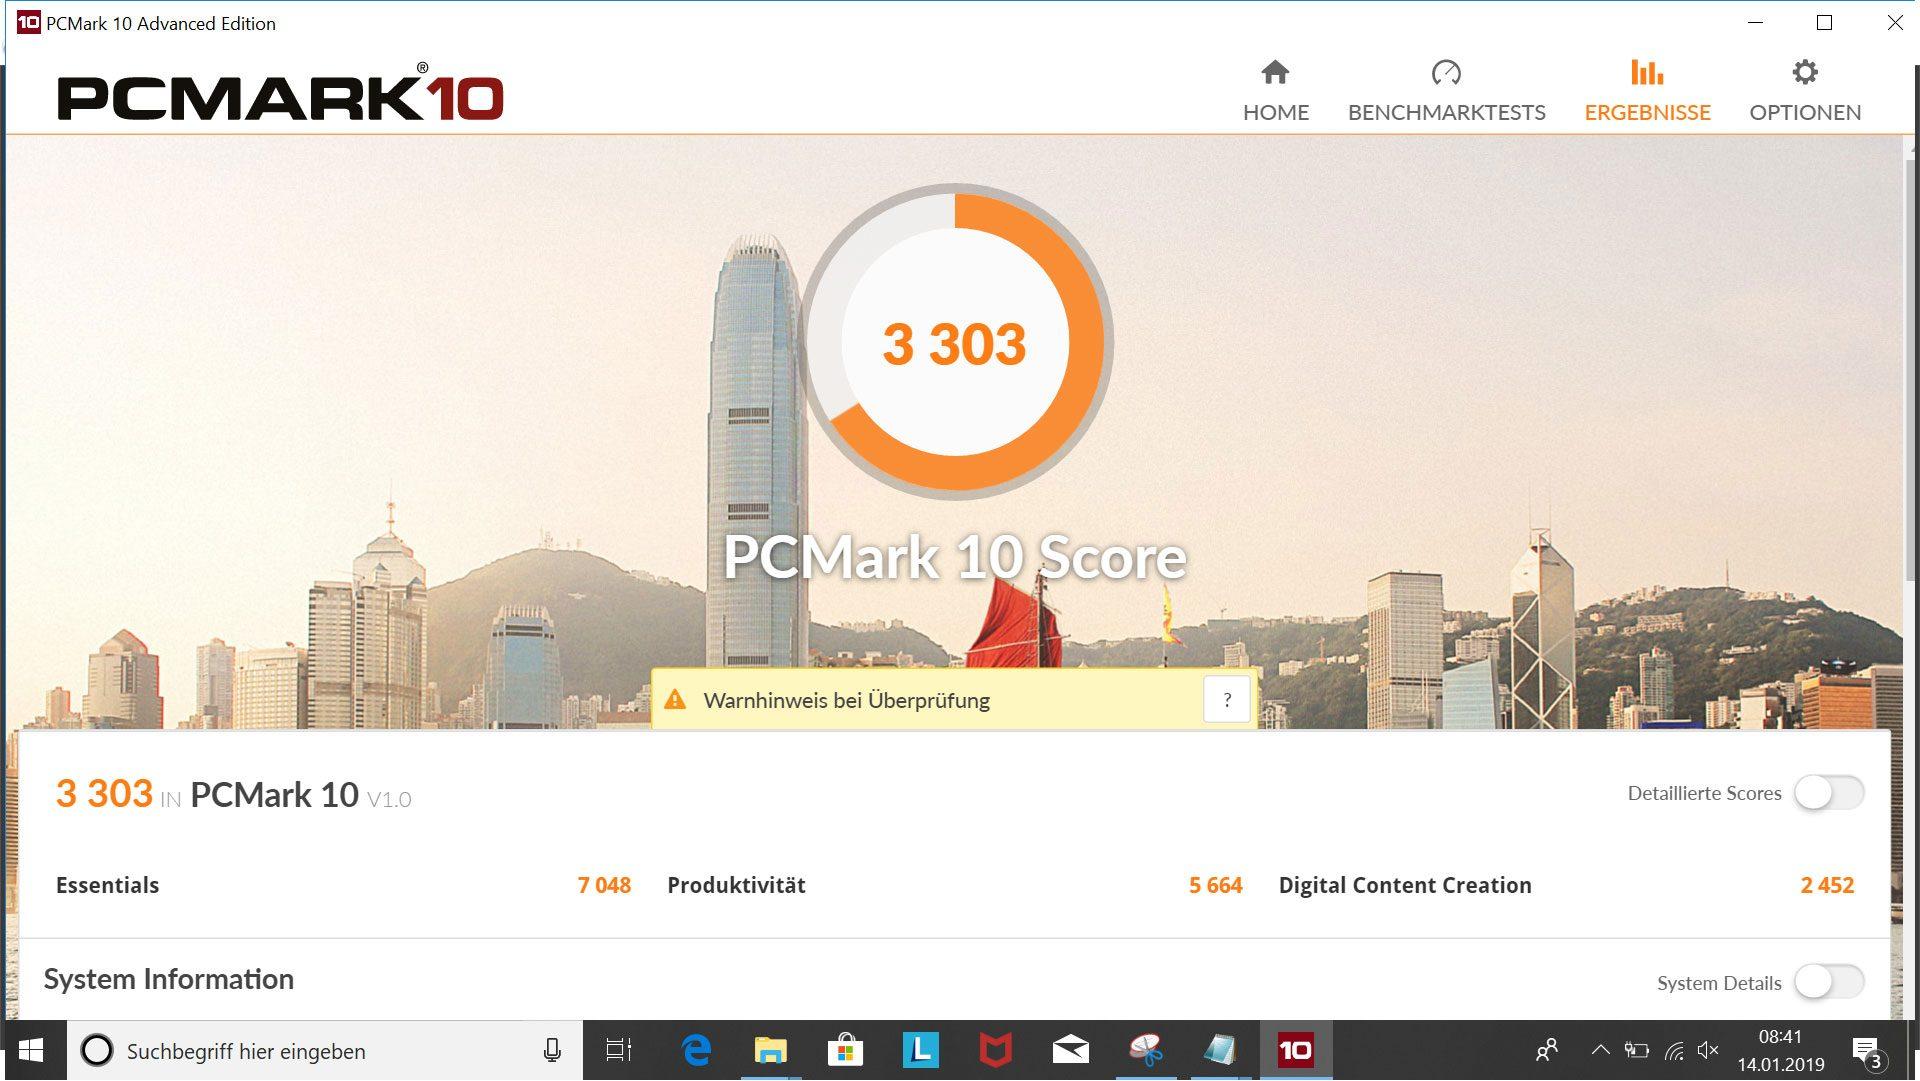 Lenovo YOGA S730-13IWL Benchmark_1